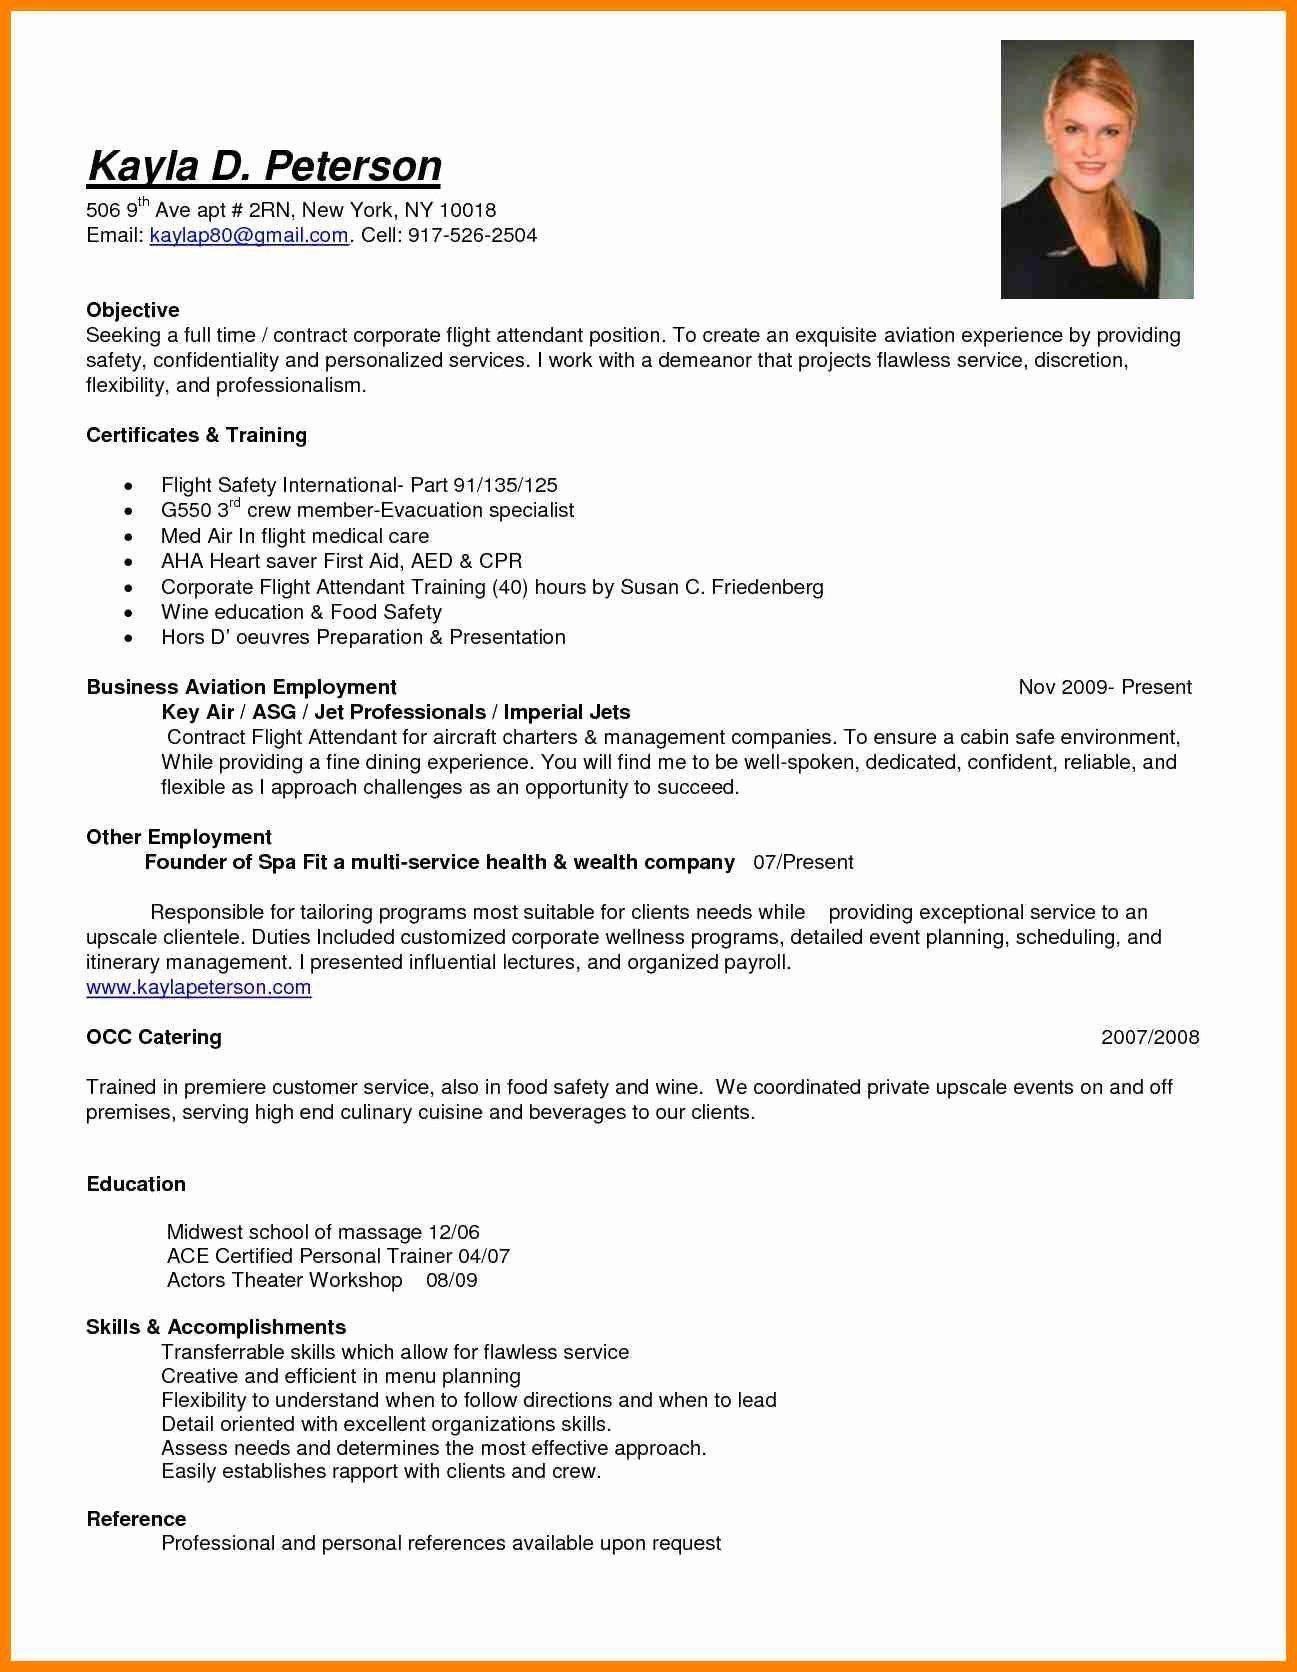 Resume Sample for Flight attendant with No Experience Flight attendant Resume No Experience Luxury 8 Cv for Flight ...